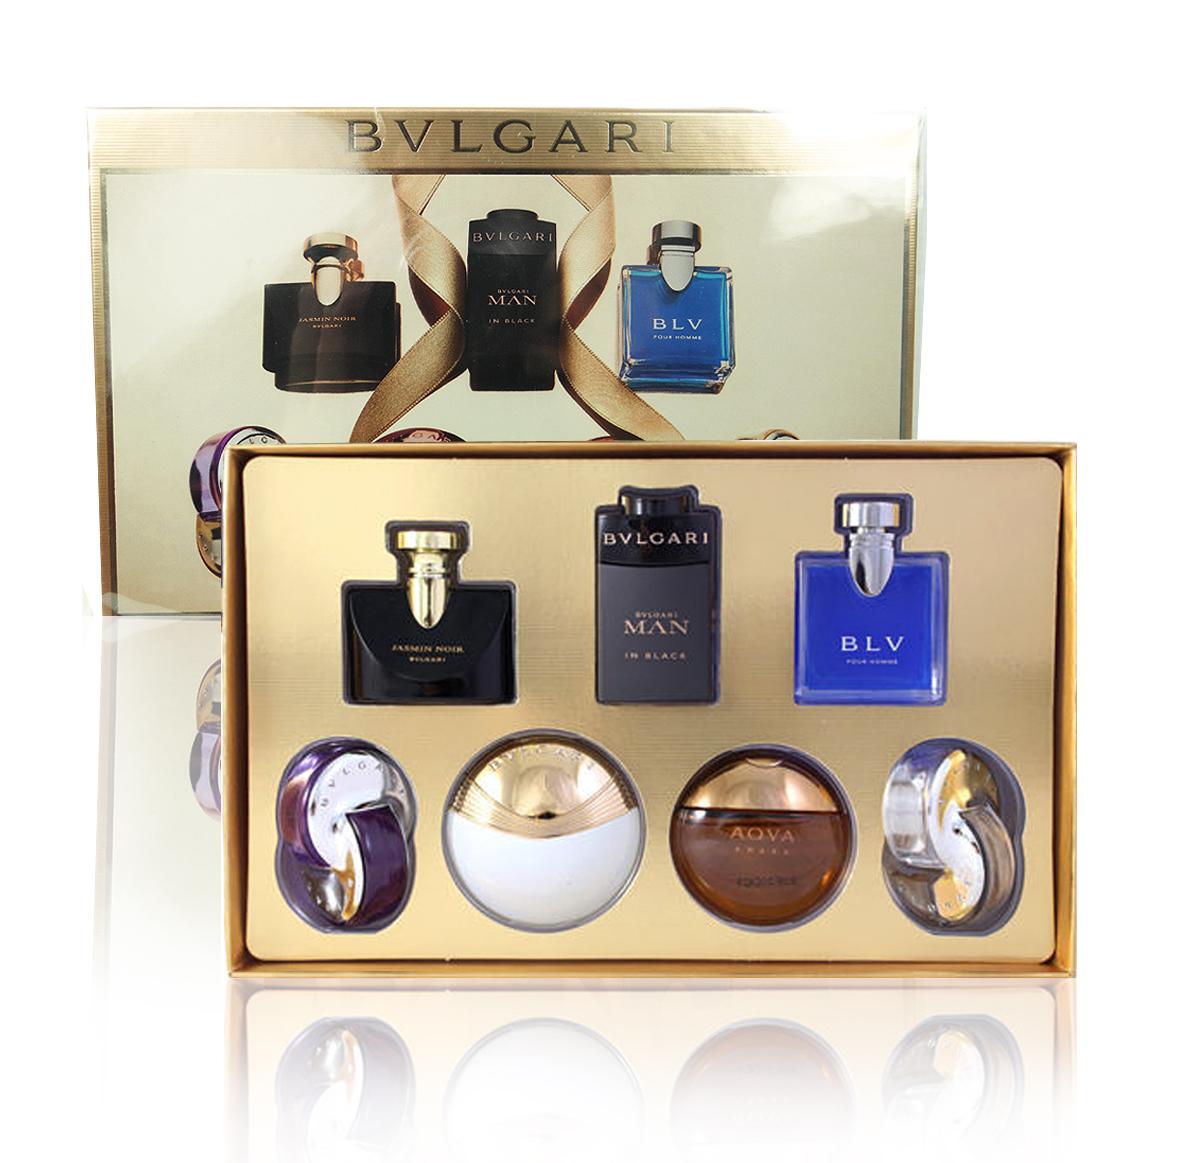 Mini Set Bvlgari 7pcs - Orchard.vn d299d0d57fd